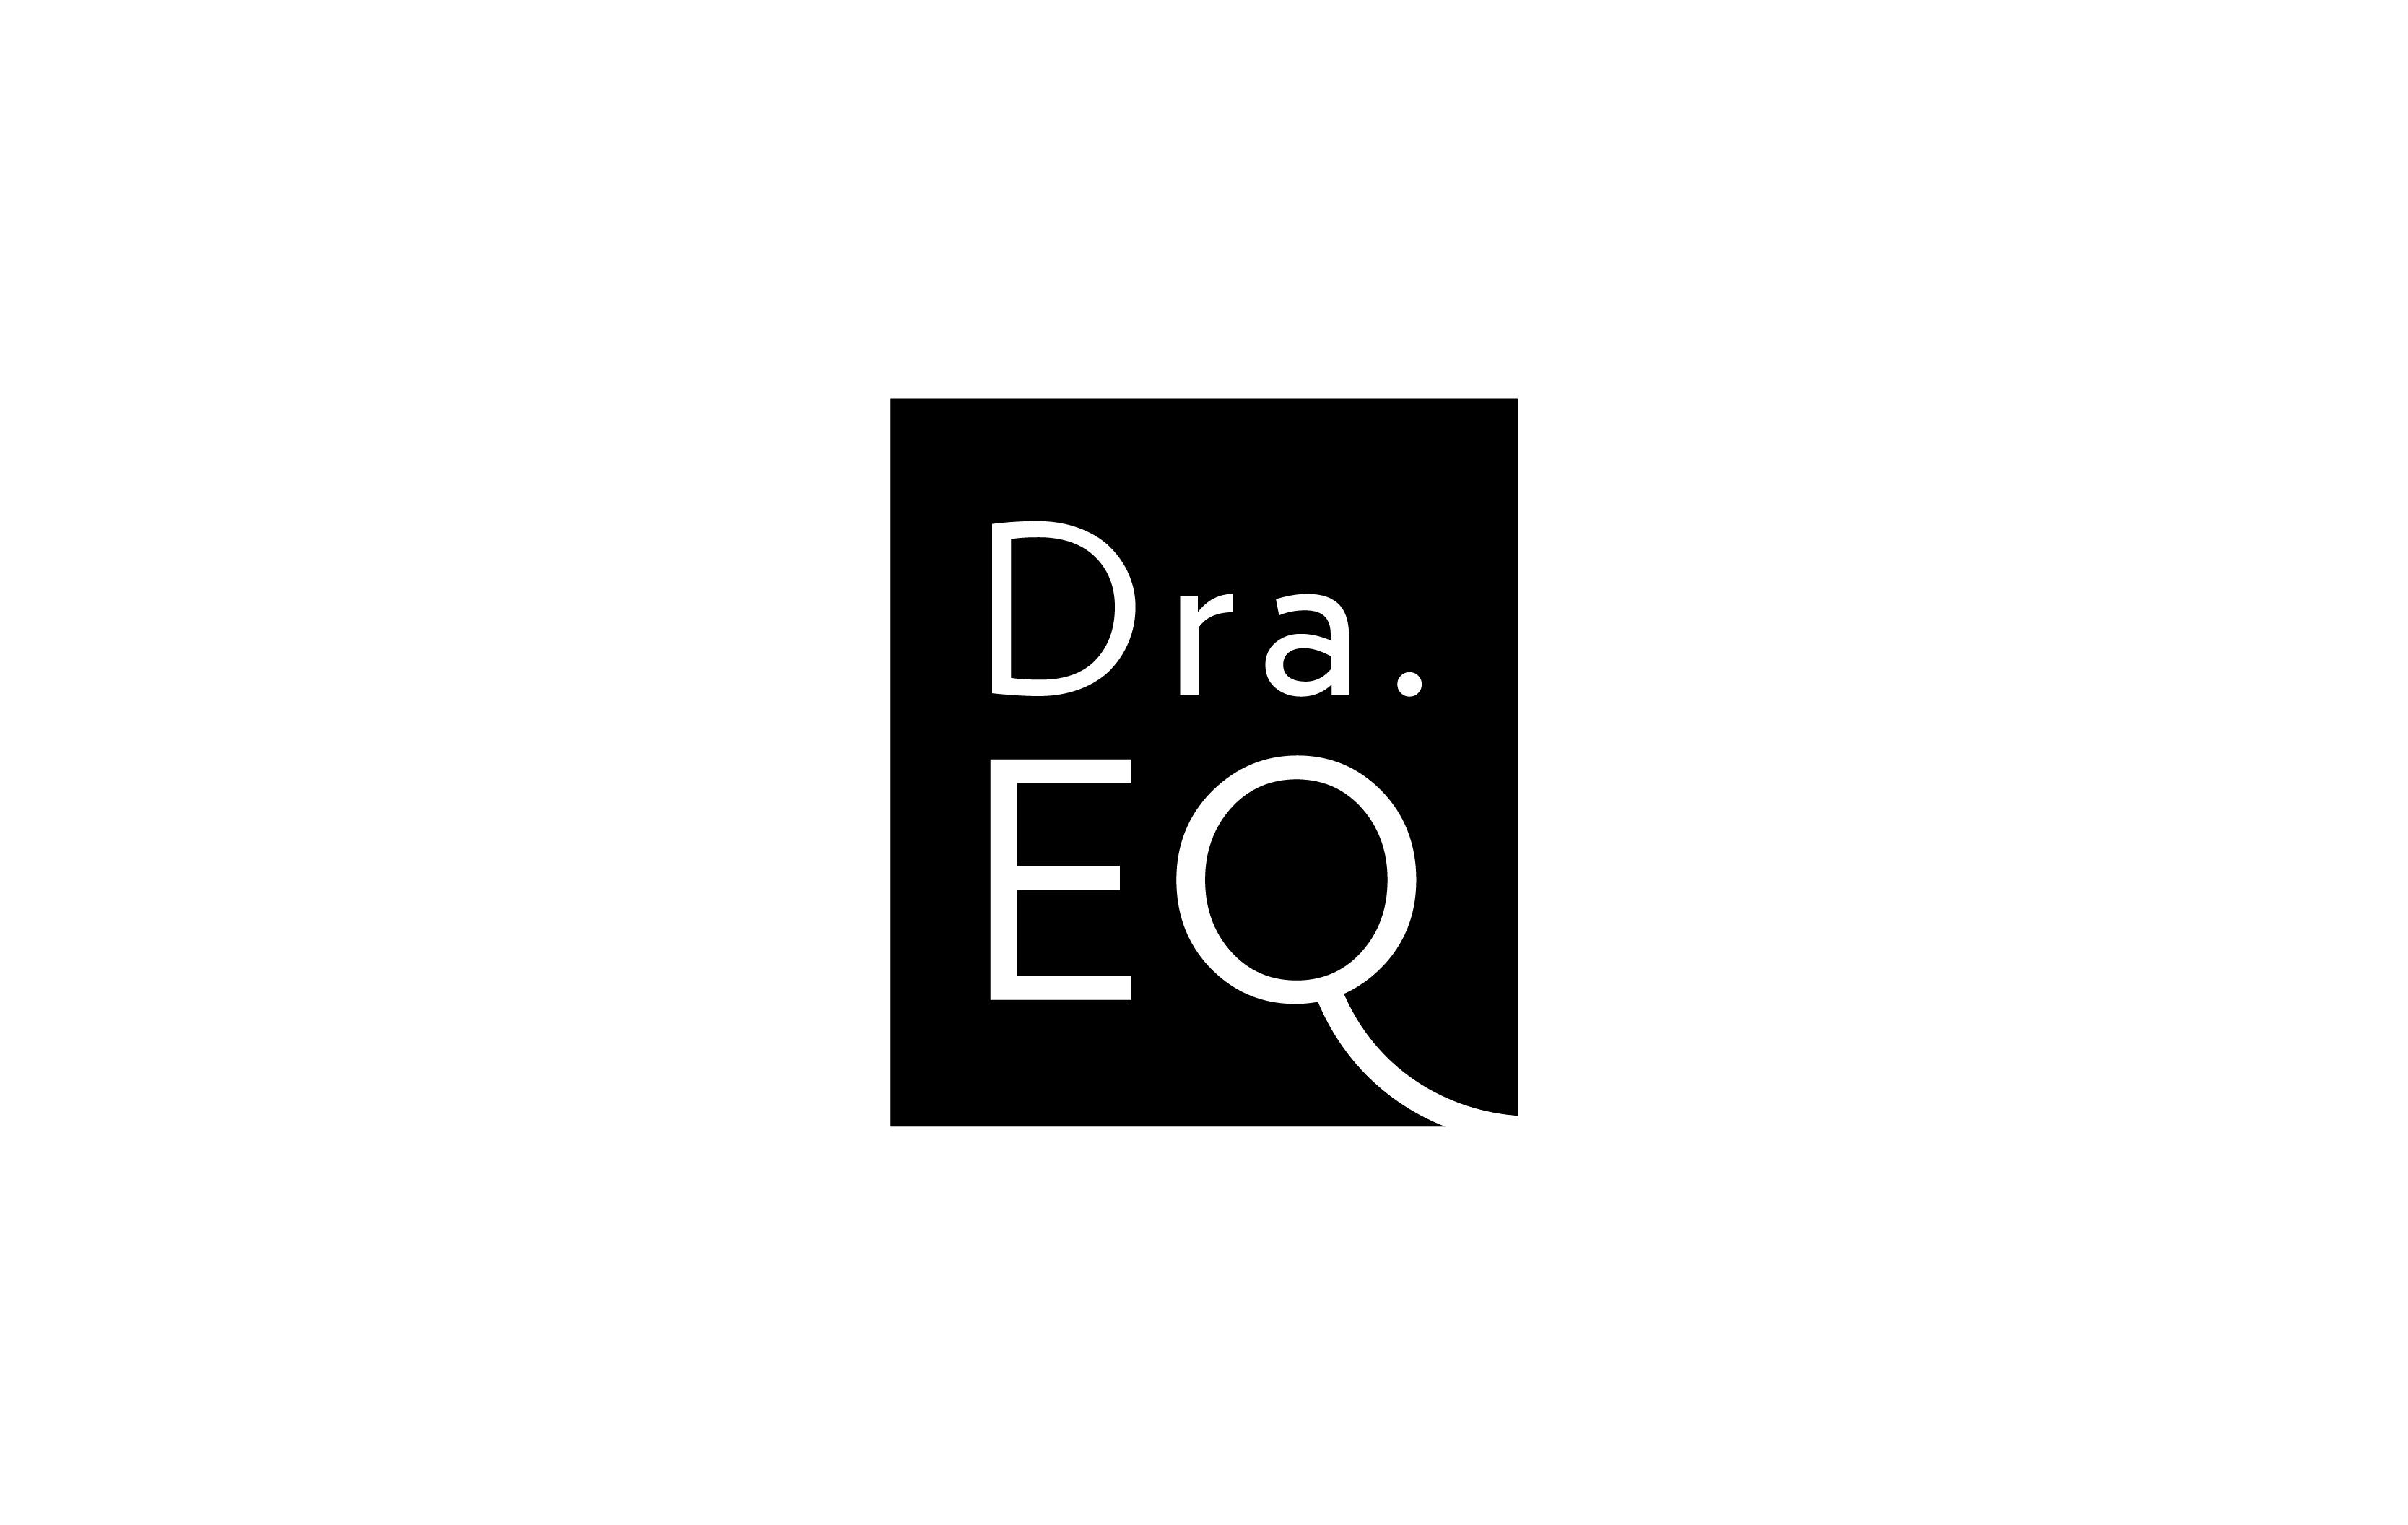 Clínica Dra. EQ Identidad Corporativa, isotipo, logotipo, branding, símbolo